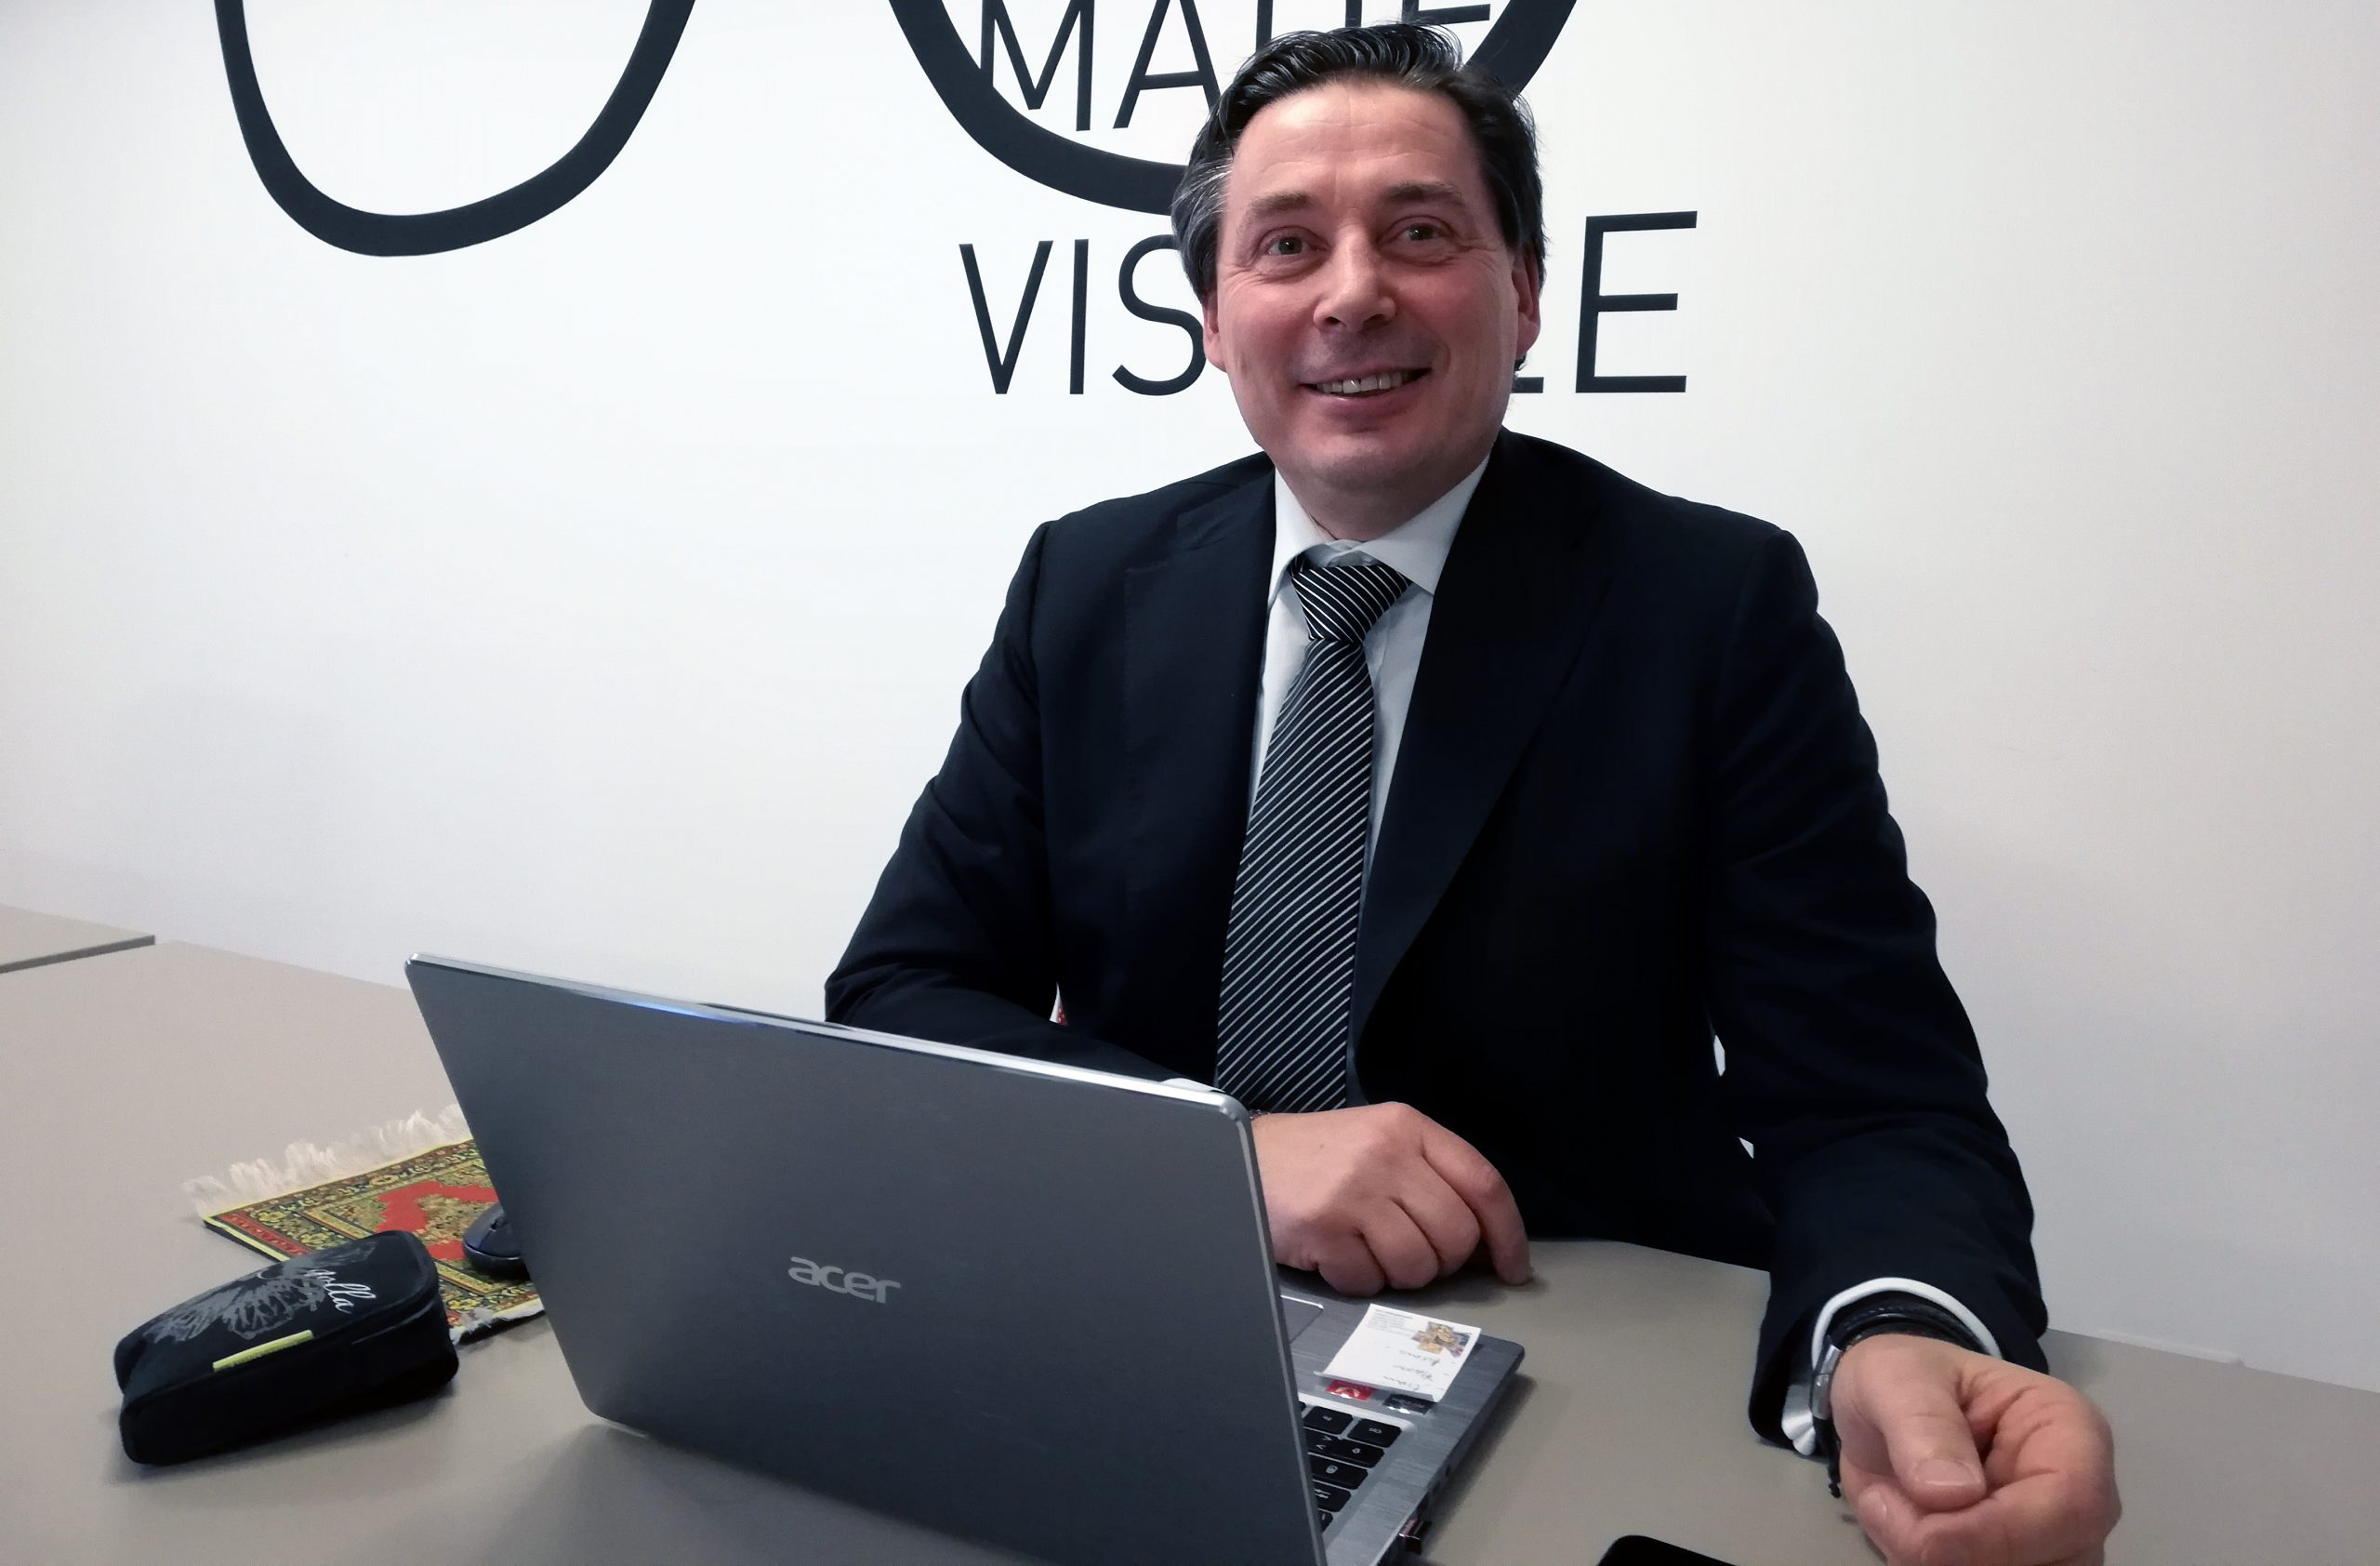 <h2>François Ryckeboer</h2><hr>Senior Manager